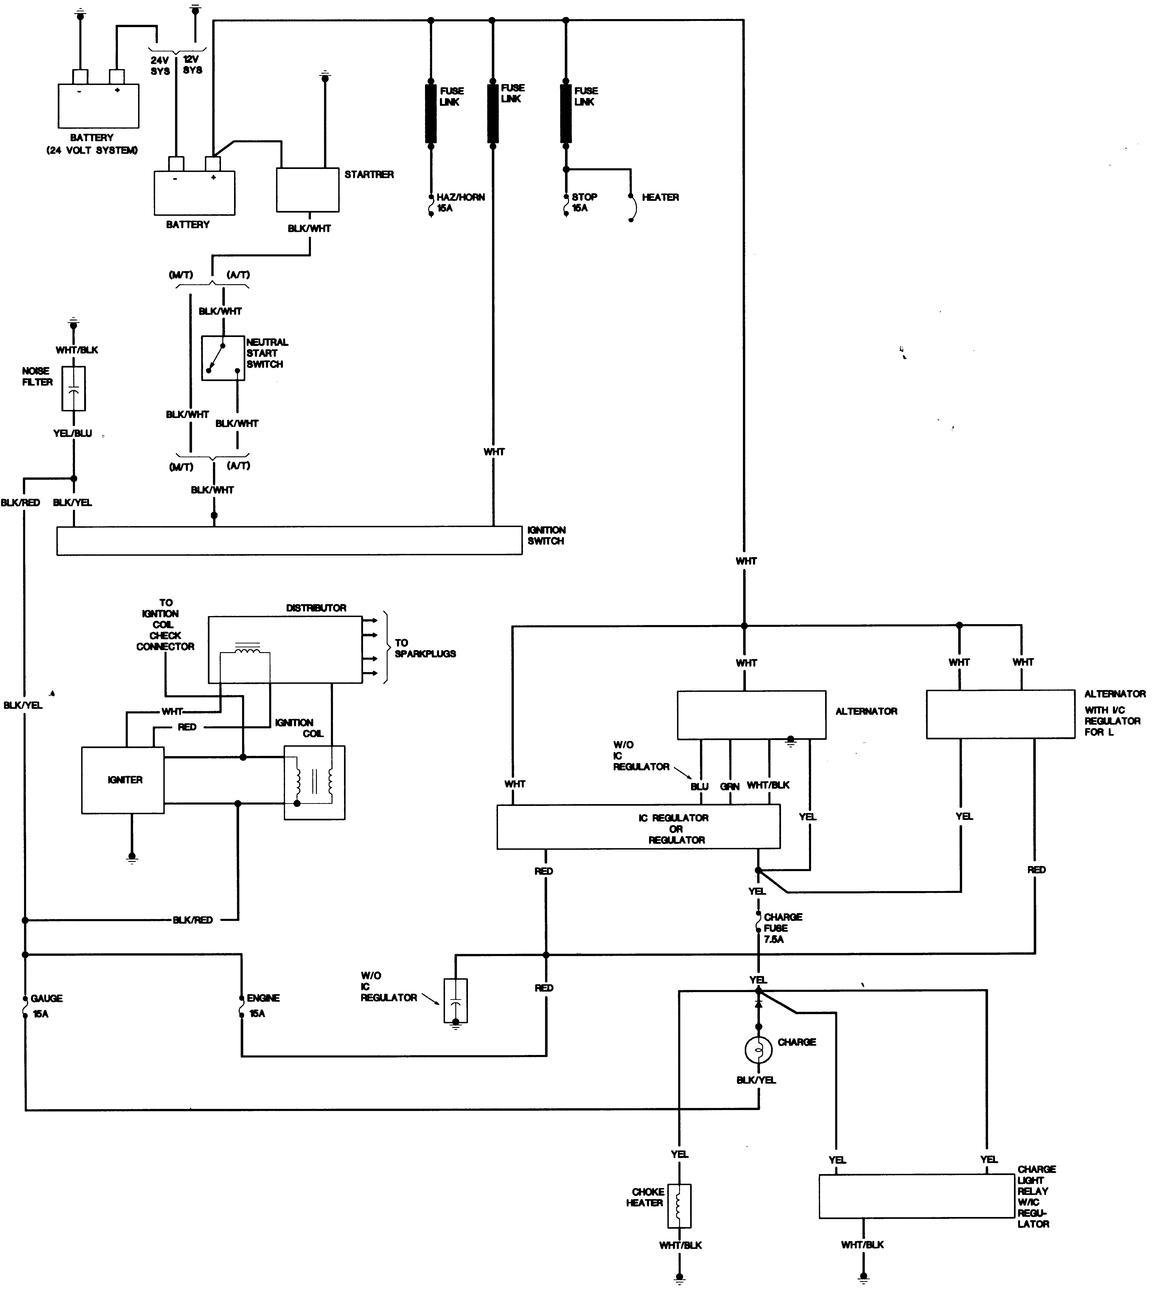 Pleasing 87 Toyota Alternator Wiring Diagram Wiring Diagram Data Schema Wiring Cloud Loplapiotaidewilluminateatxorg